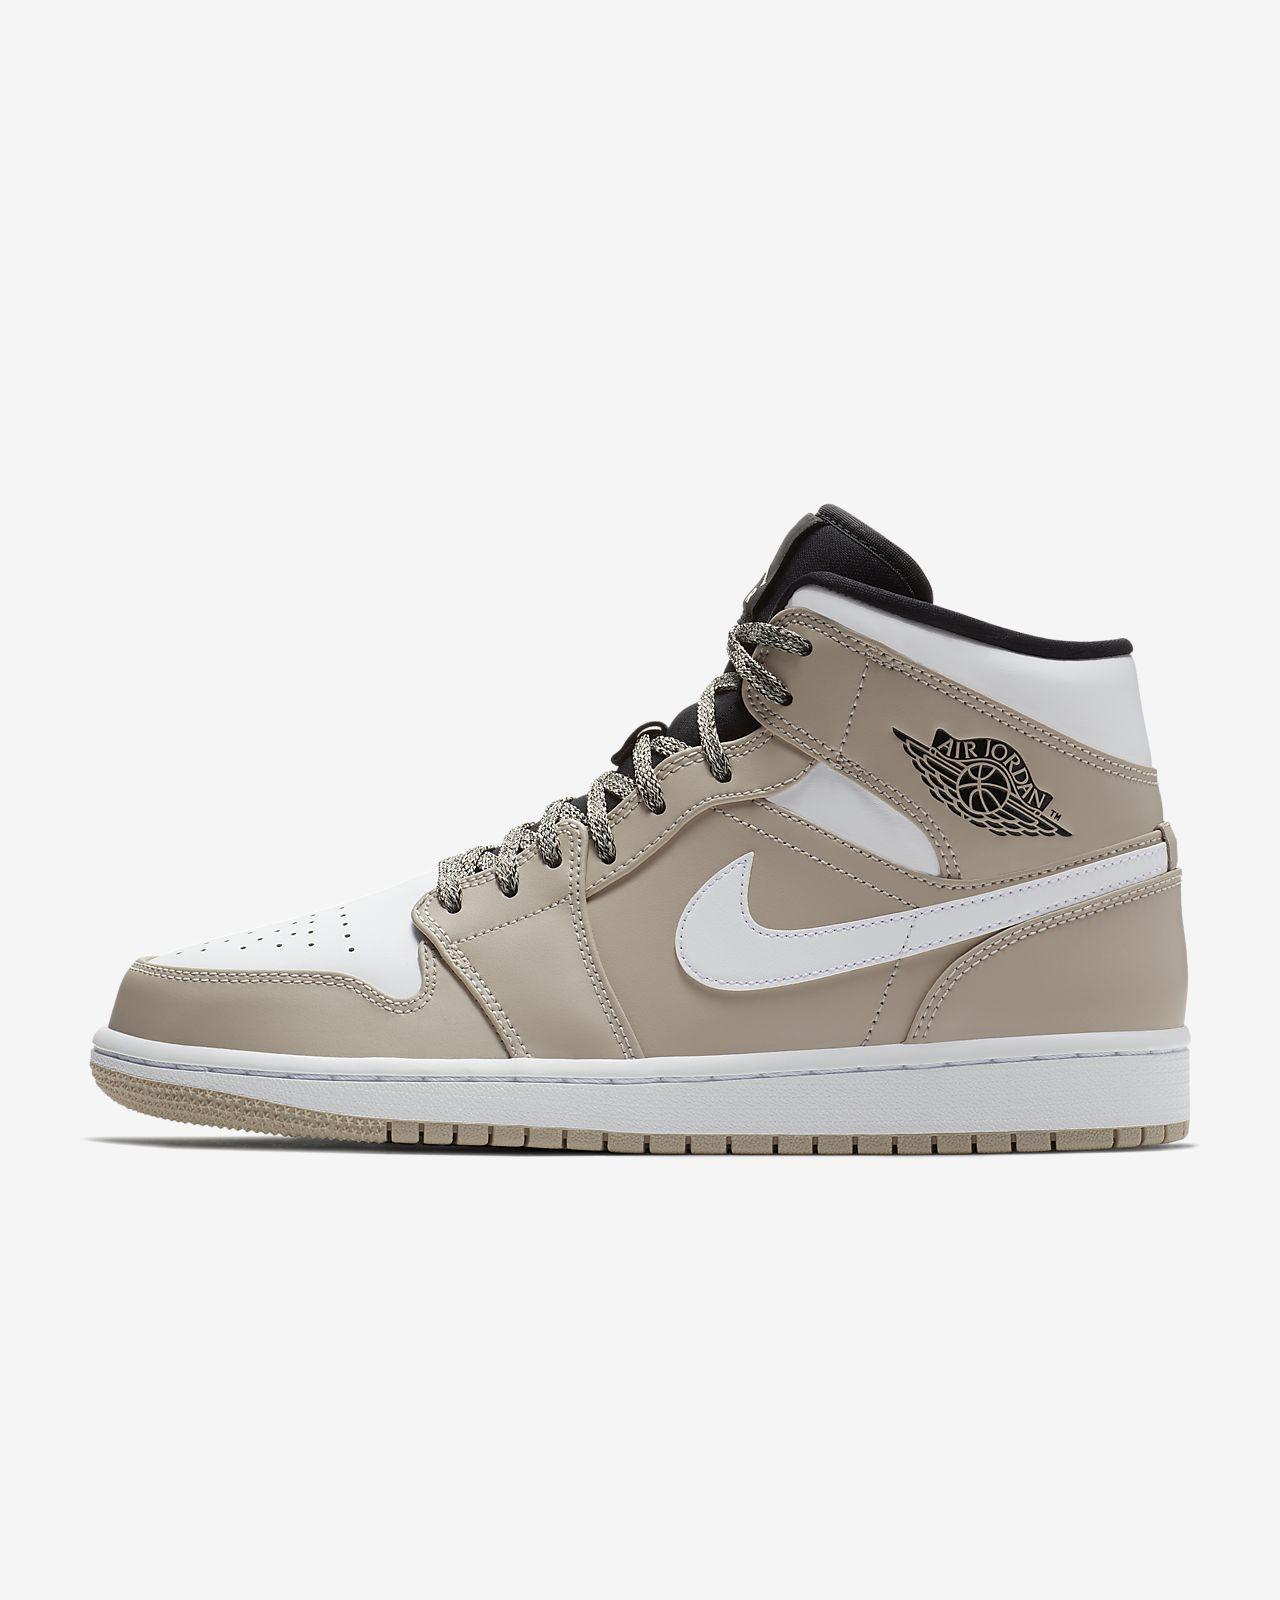 Nike Air Jordan 1 Mid Men's Lifestyle Shoes Black/White/Grey wN6735G